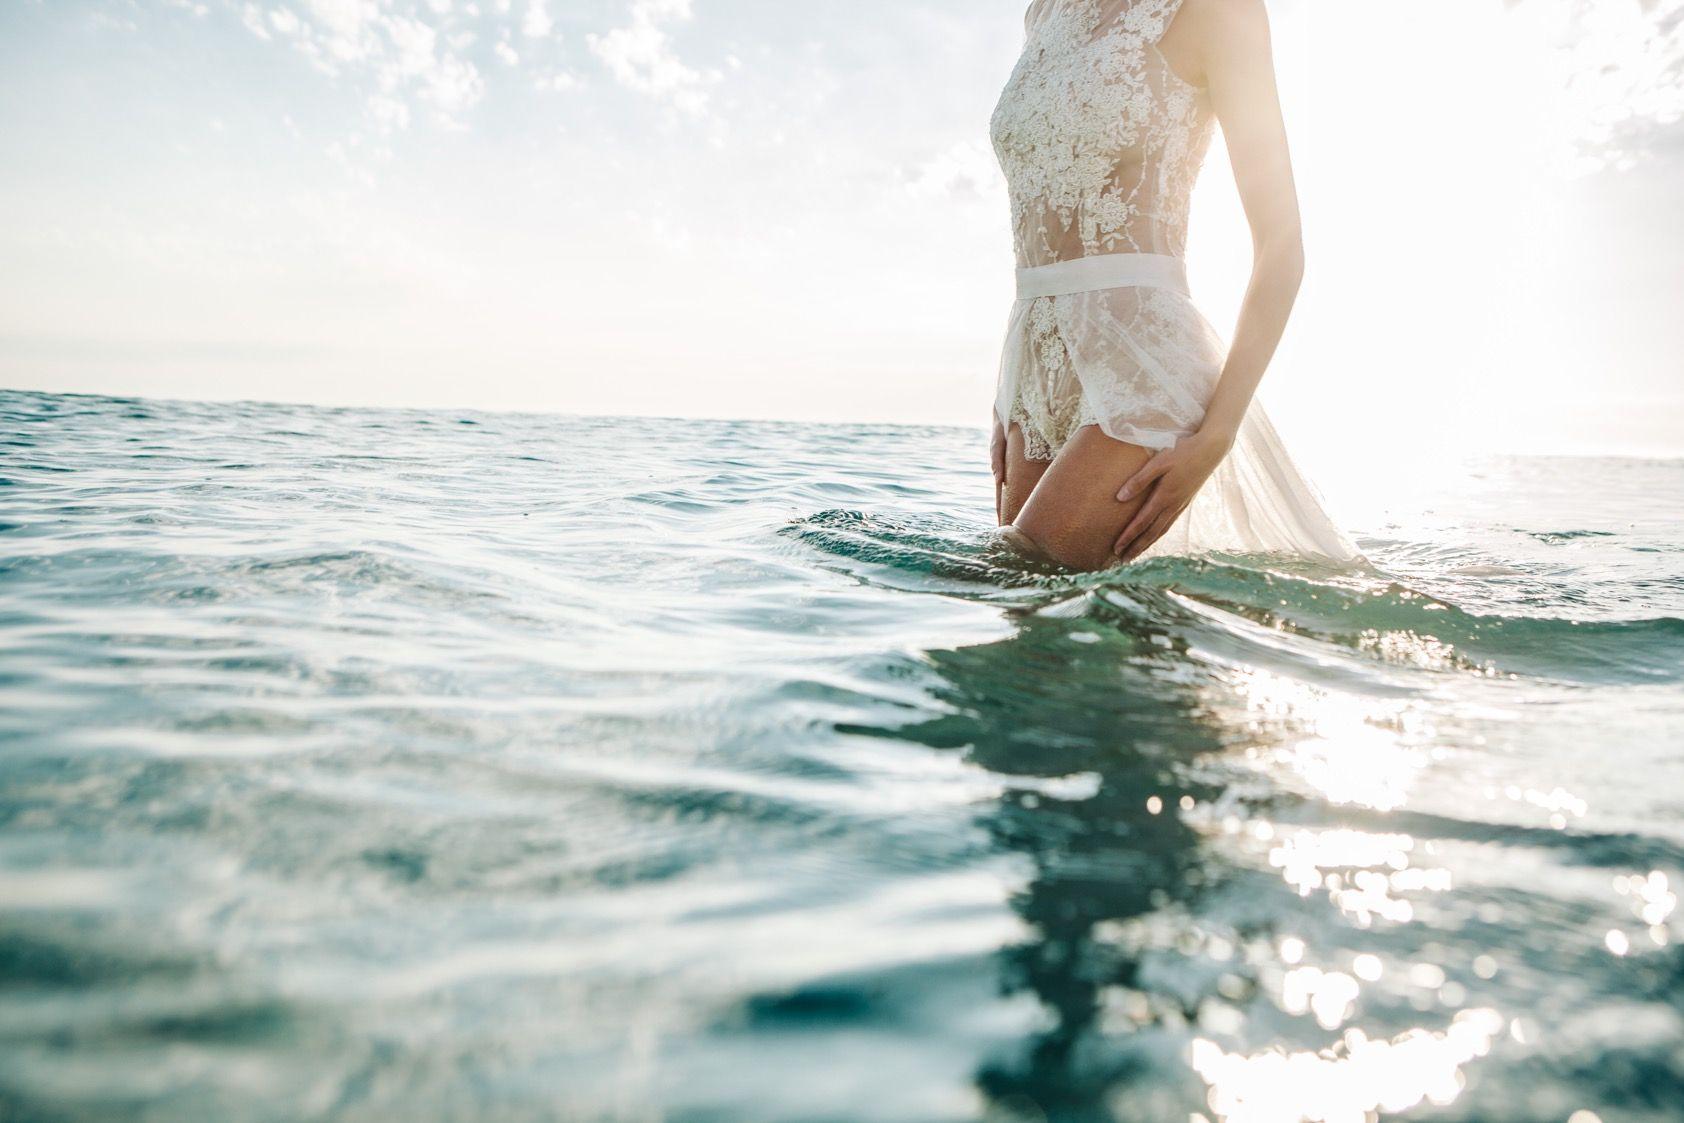 kohls wedding dresses Bridal Dress water summer sunshine ocean